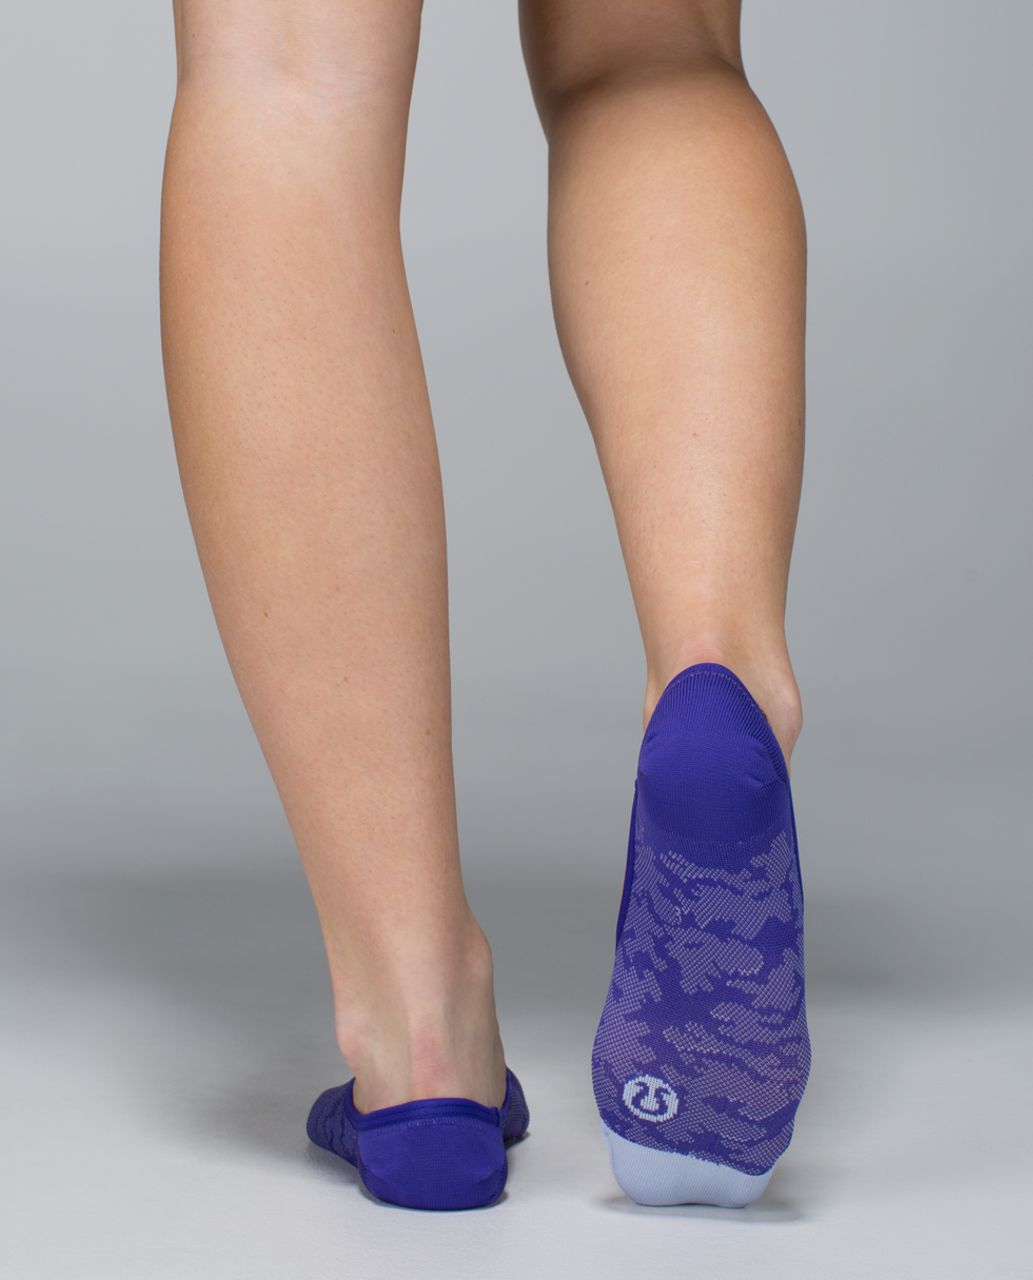 Lululemon Women's No-Sock Sock - Camo Bruised Berry